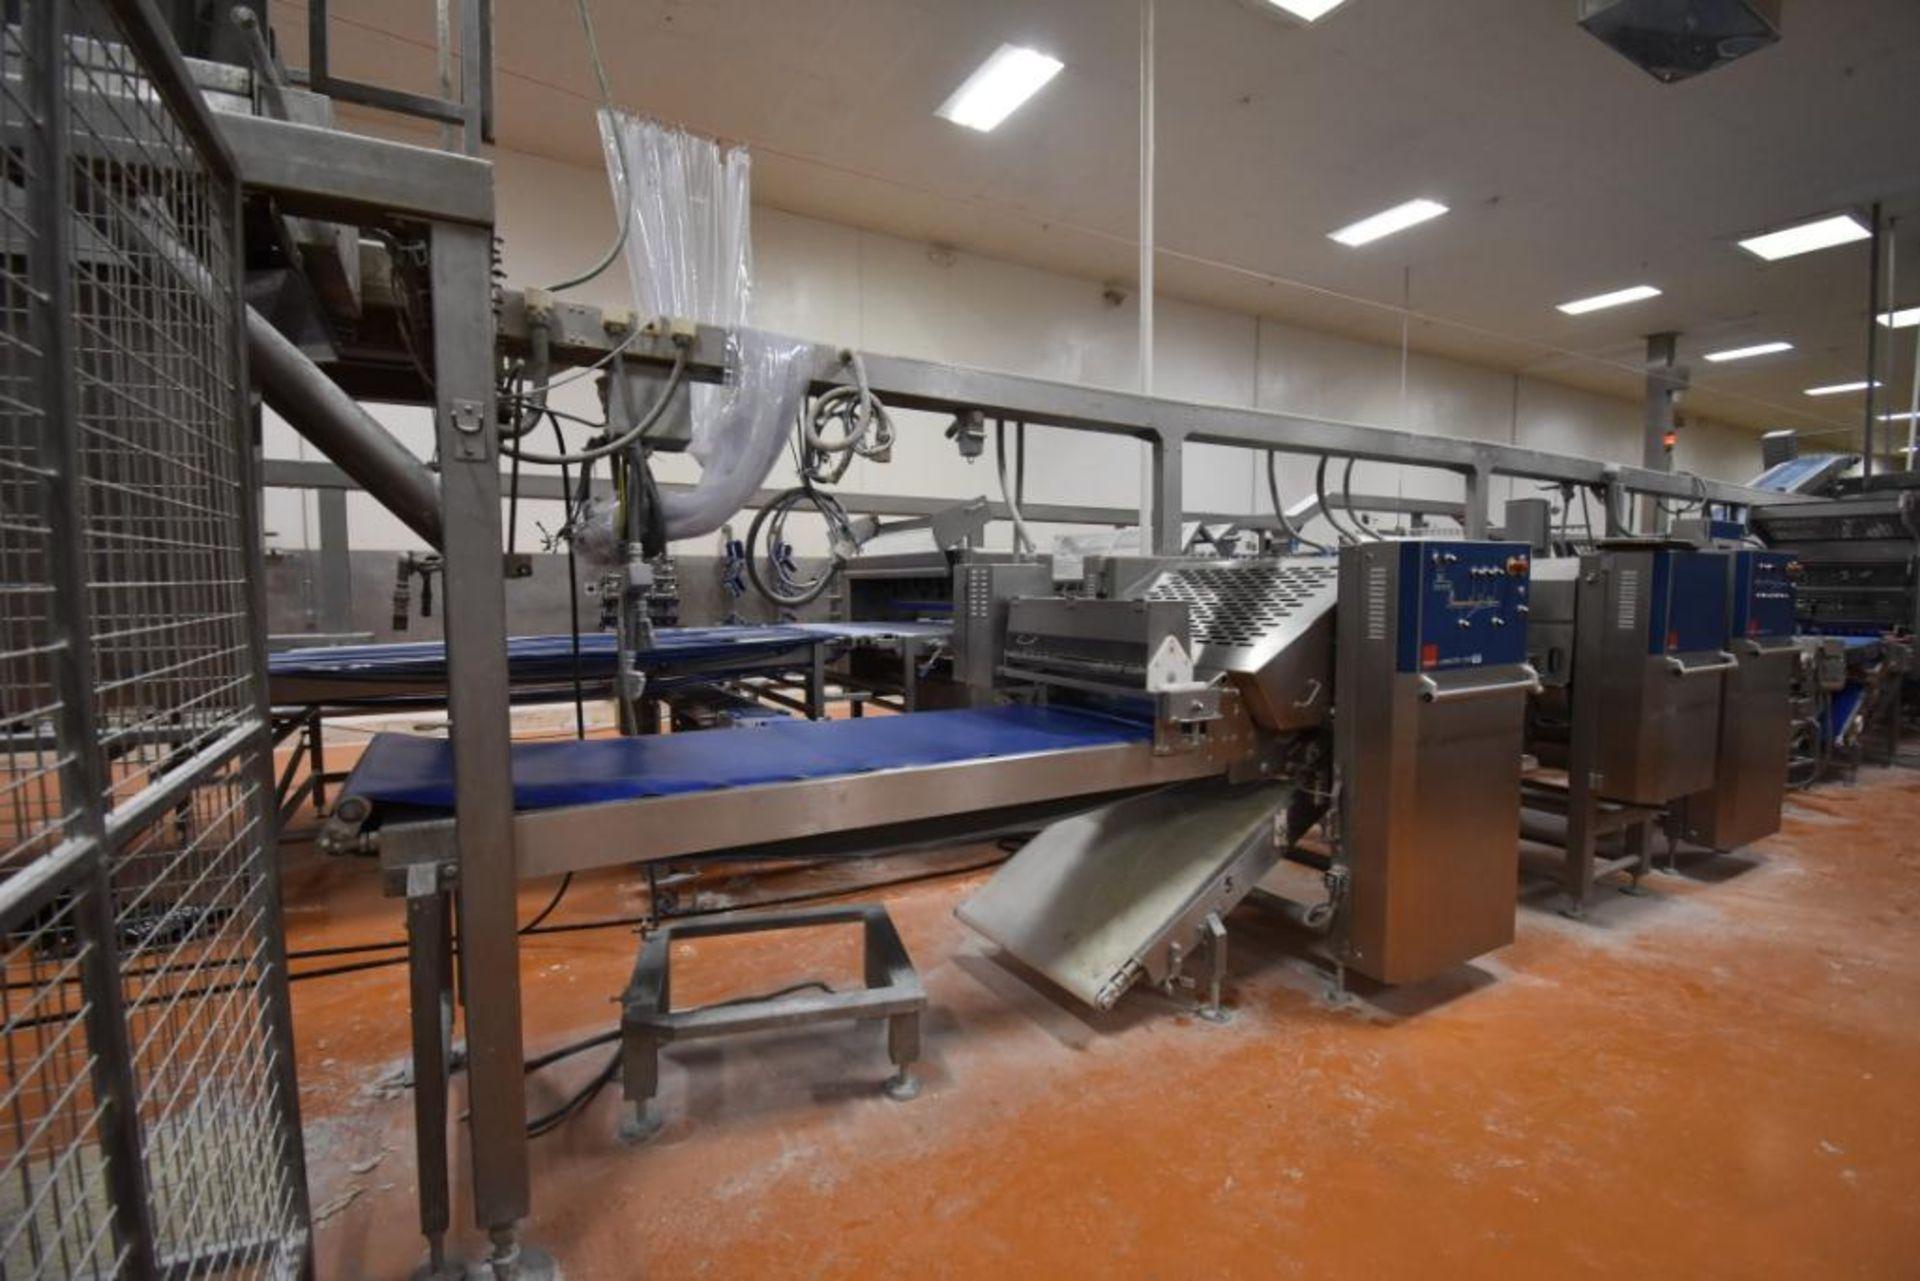 2007 Fritsch Laminator 3000 dough line - Image 56 of 280